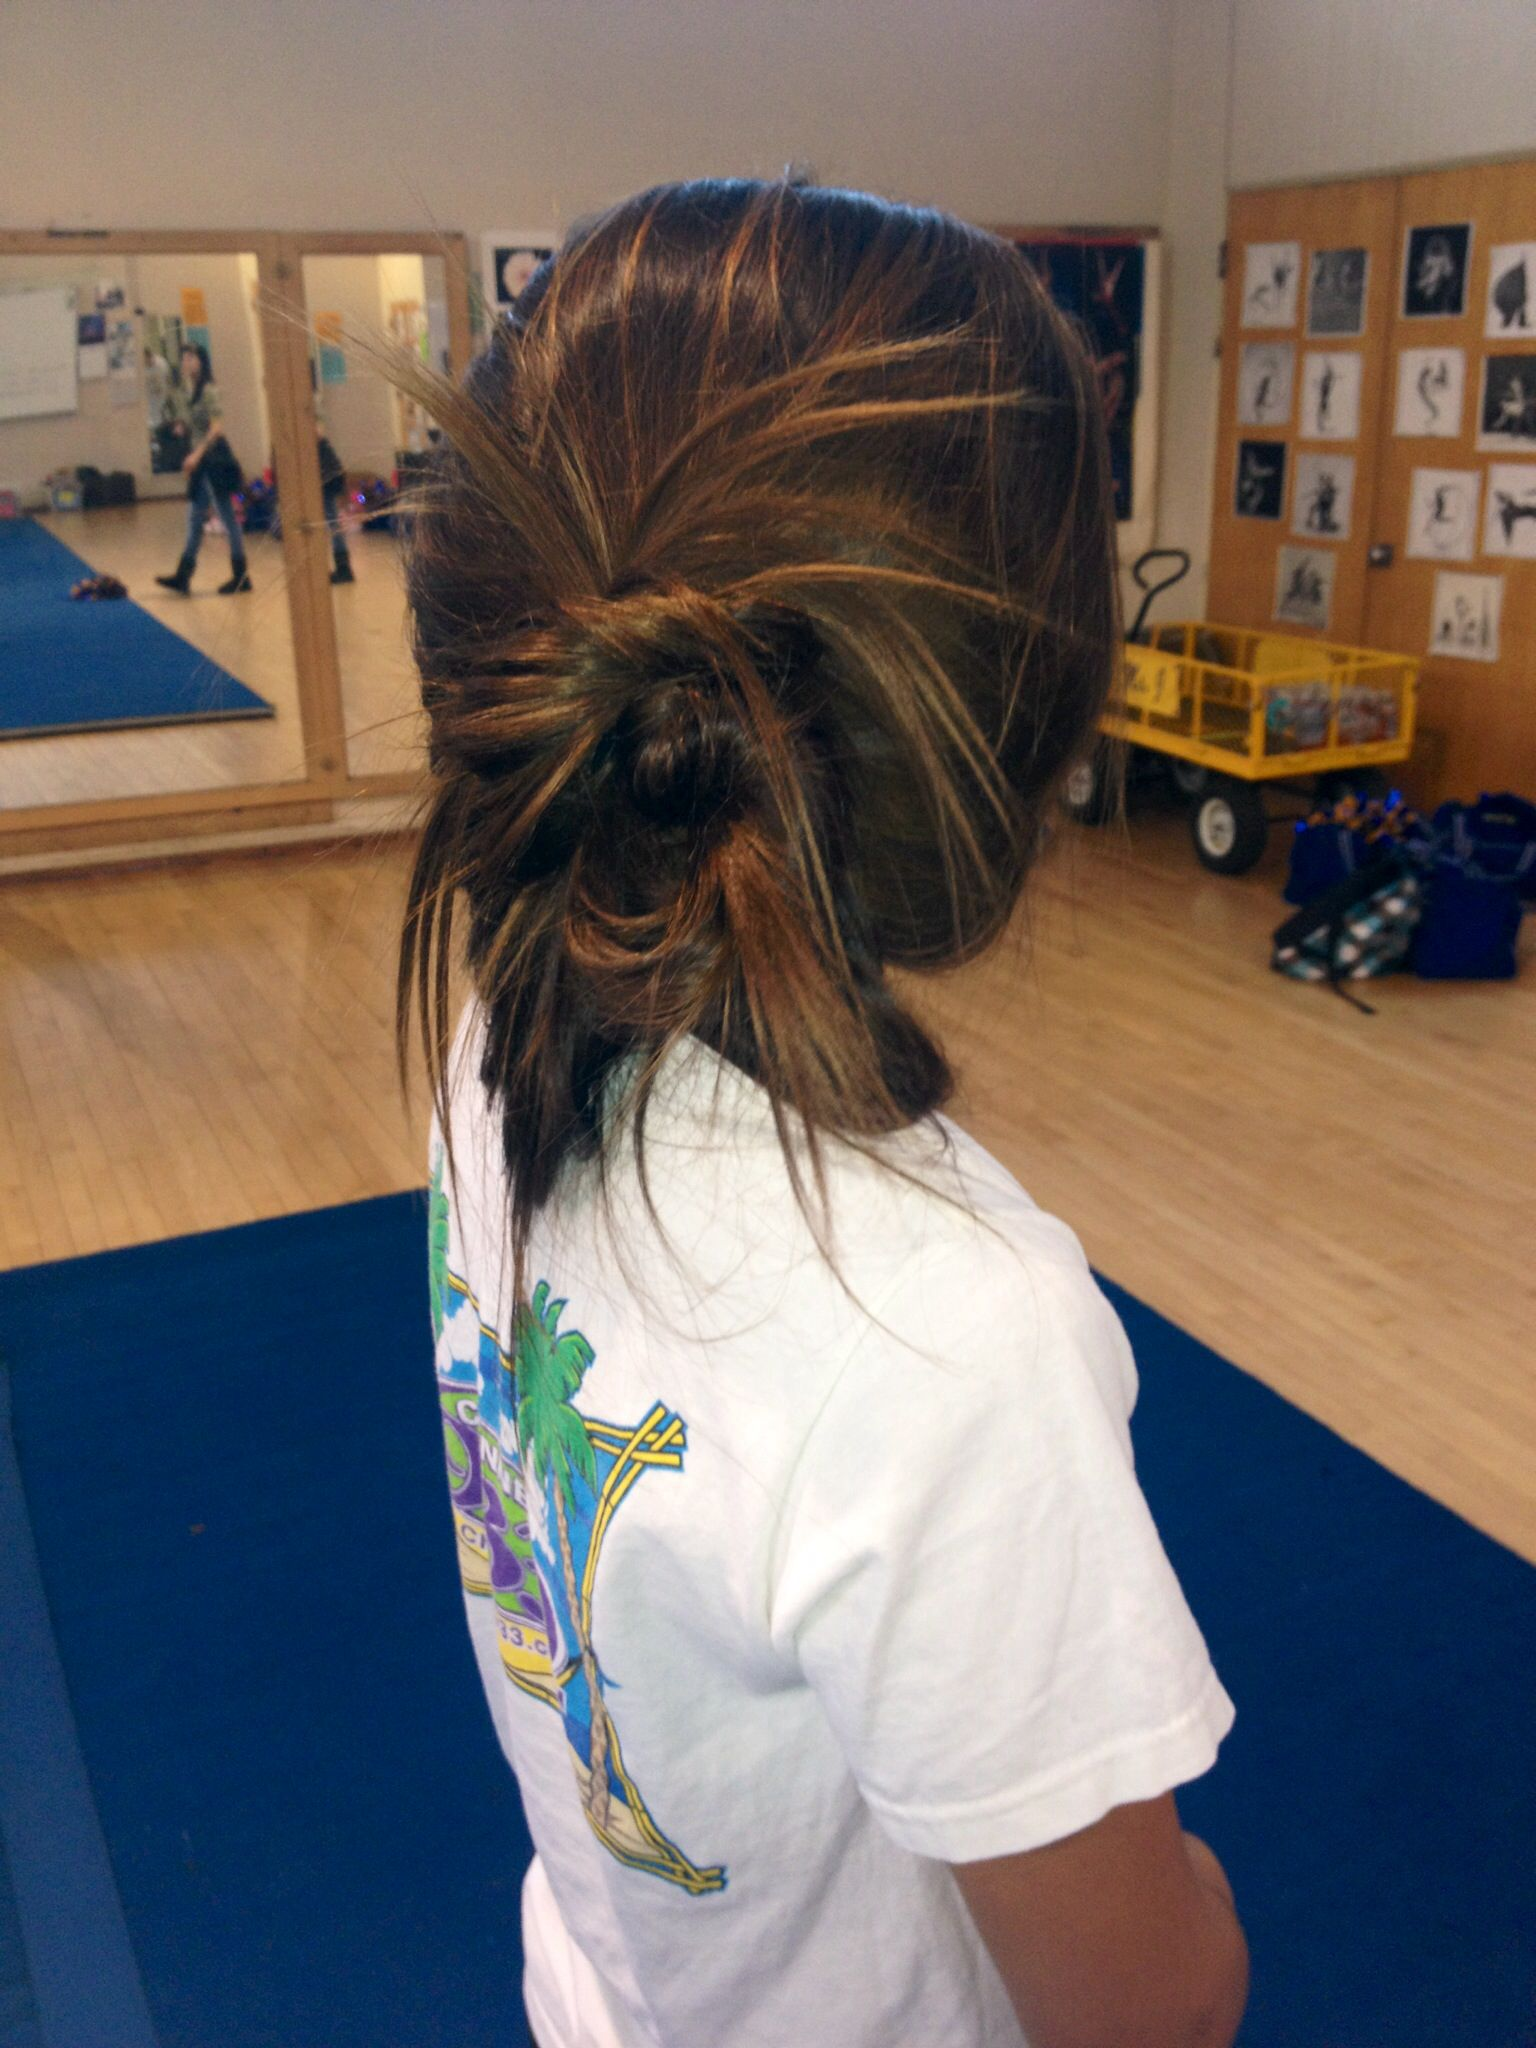 perfect hair for cheer practice | hair | cheer hair, hair